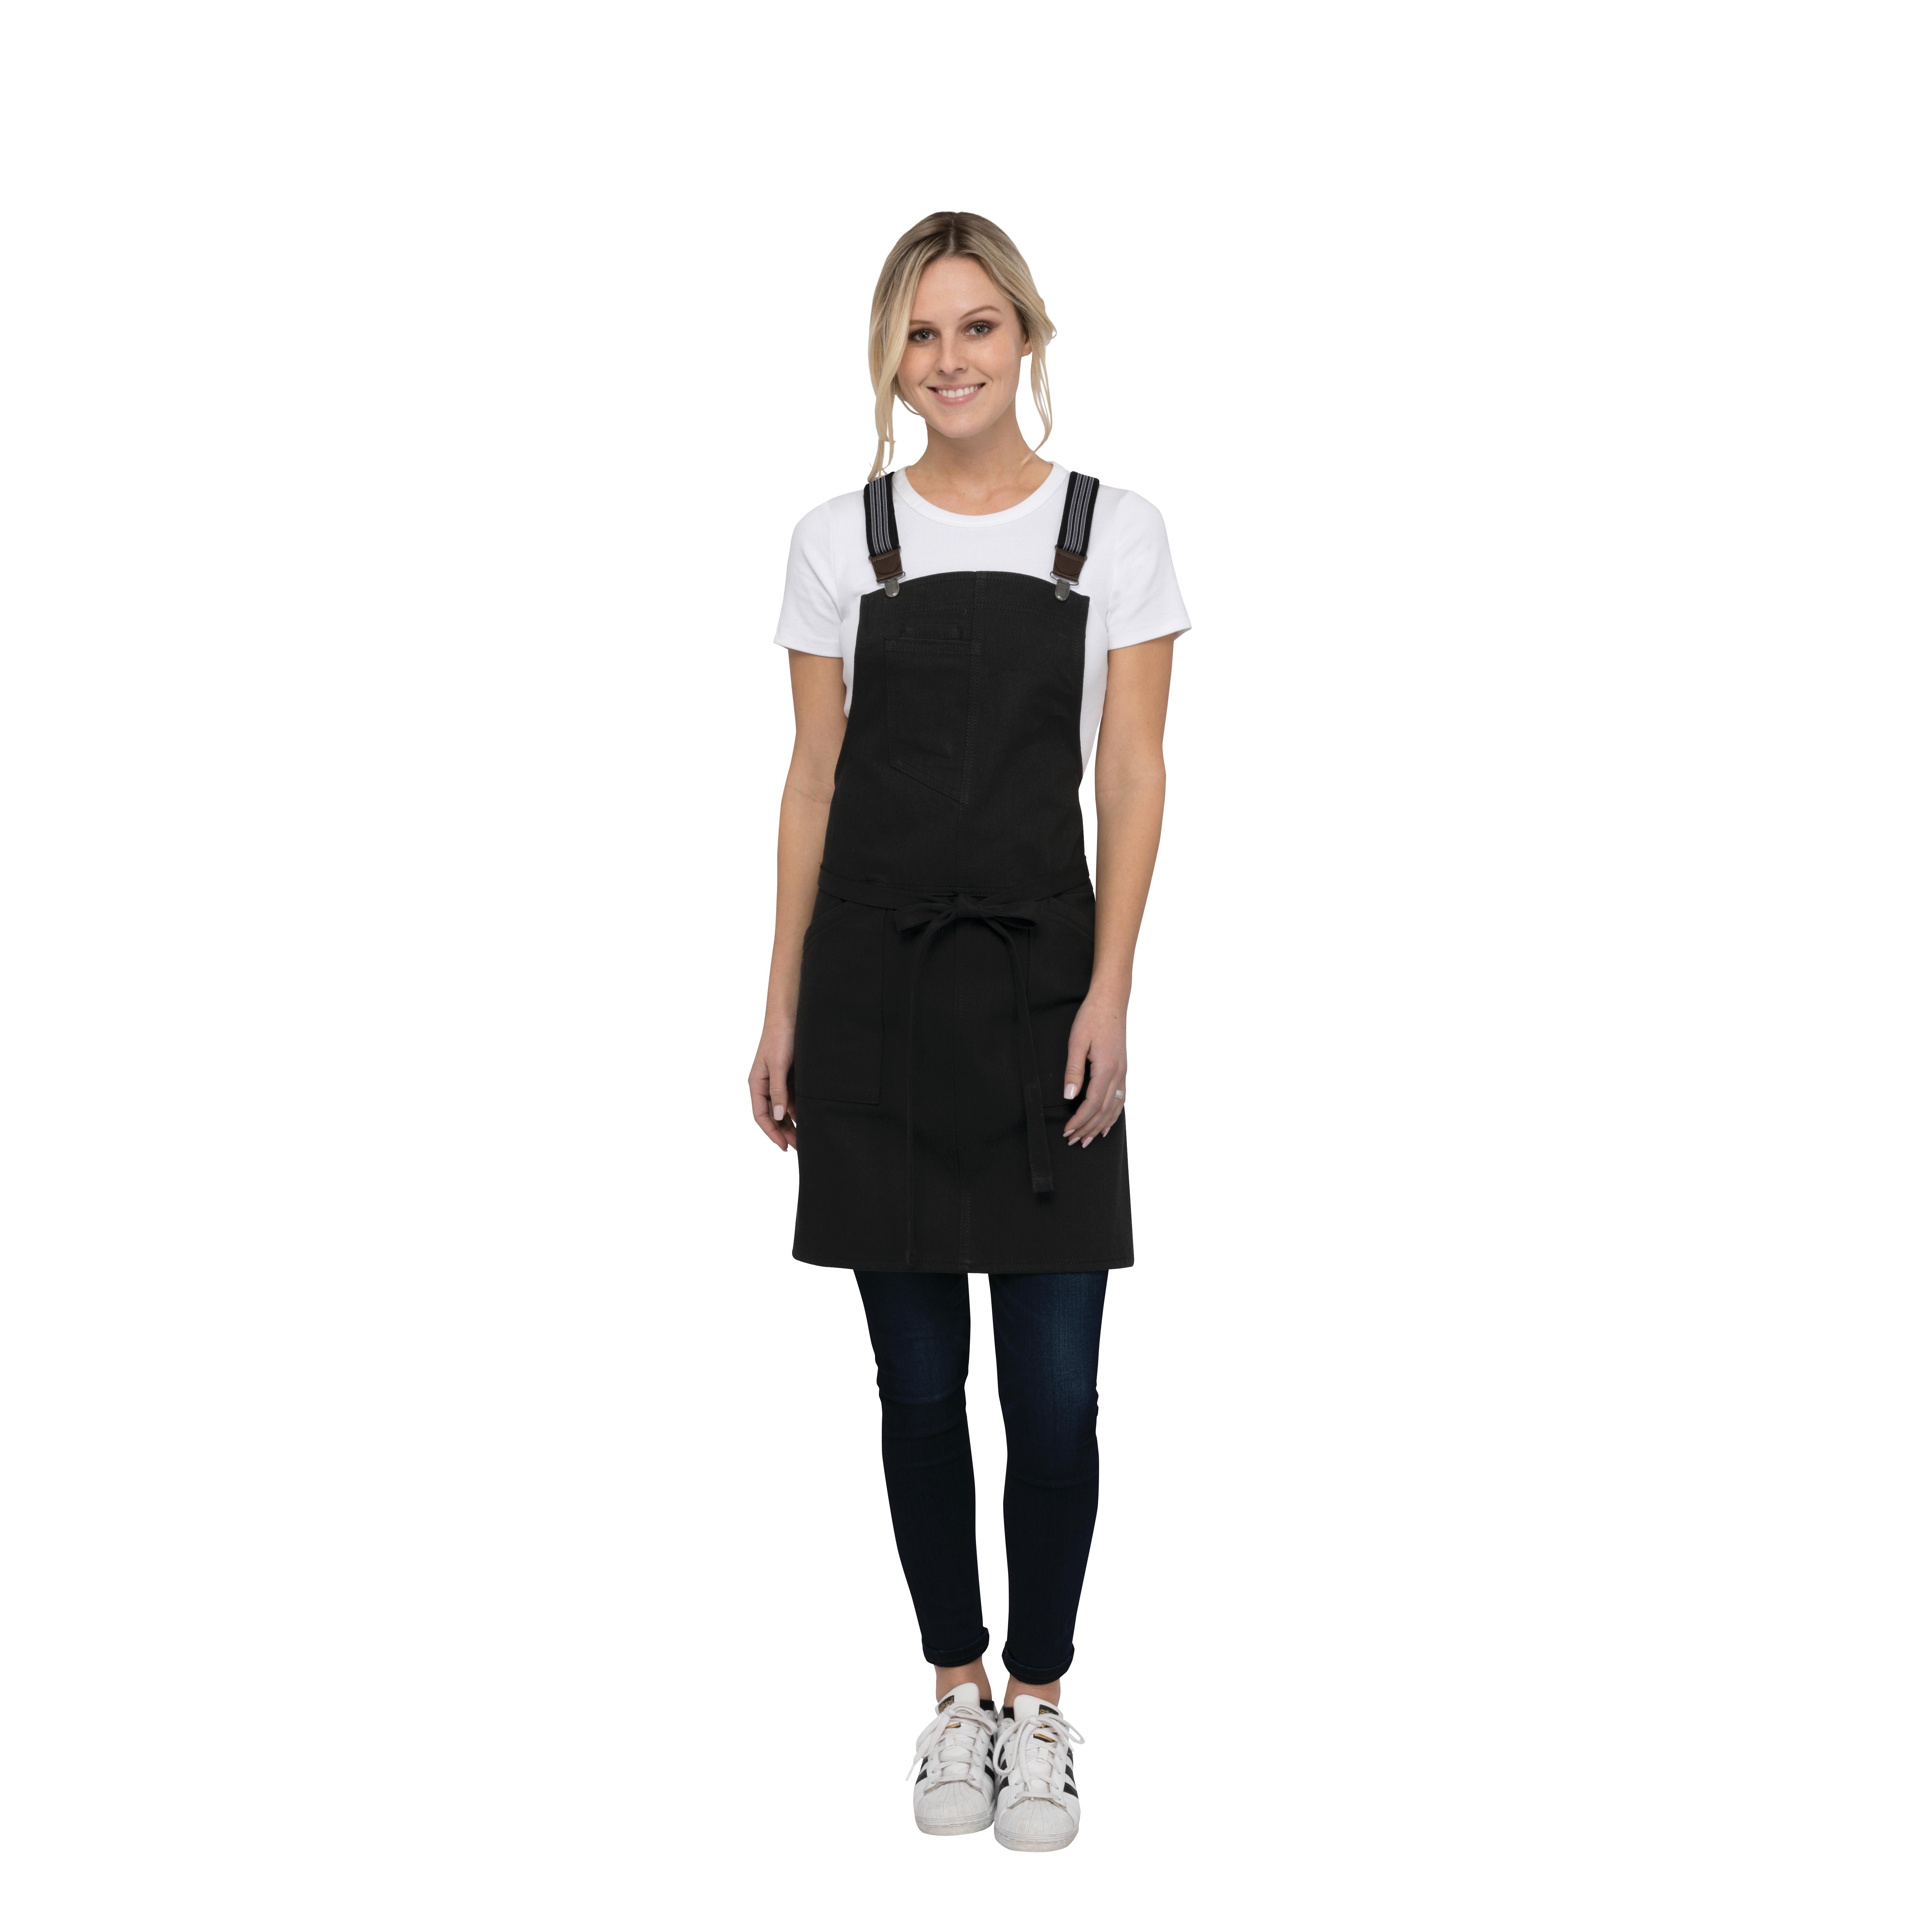 Chef Works ABS01WJBK0 bib apron